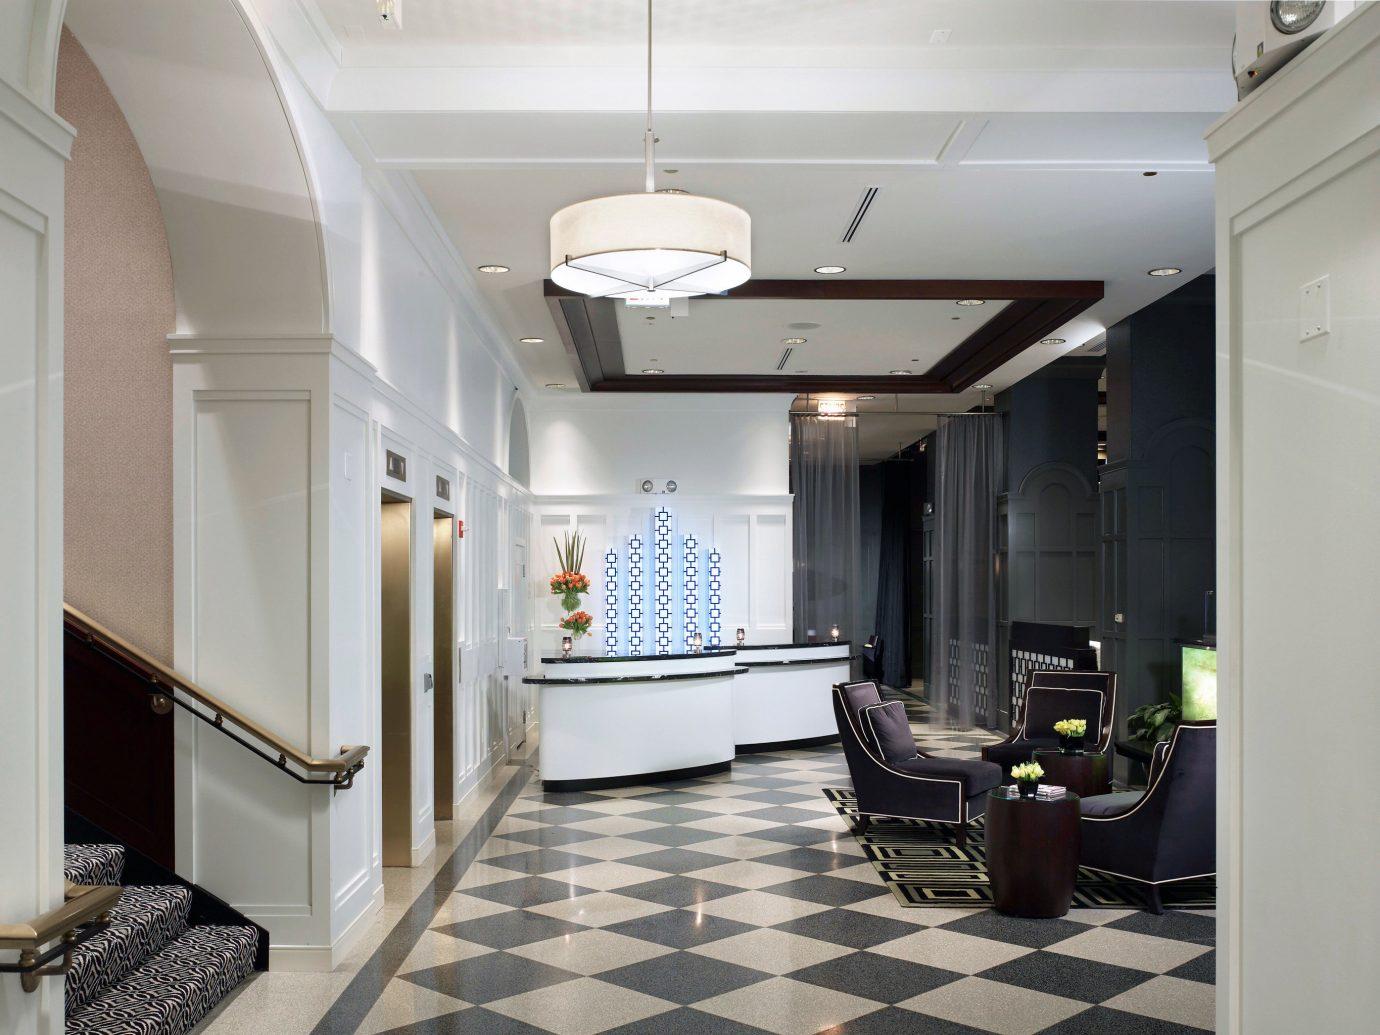 Classic Lobby Lounge Resort Trip Ideas indoor wall floor property room interior design home estate real estate living room ceiling Design flooring loft hall cottage apartment furniture